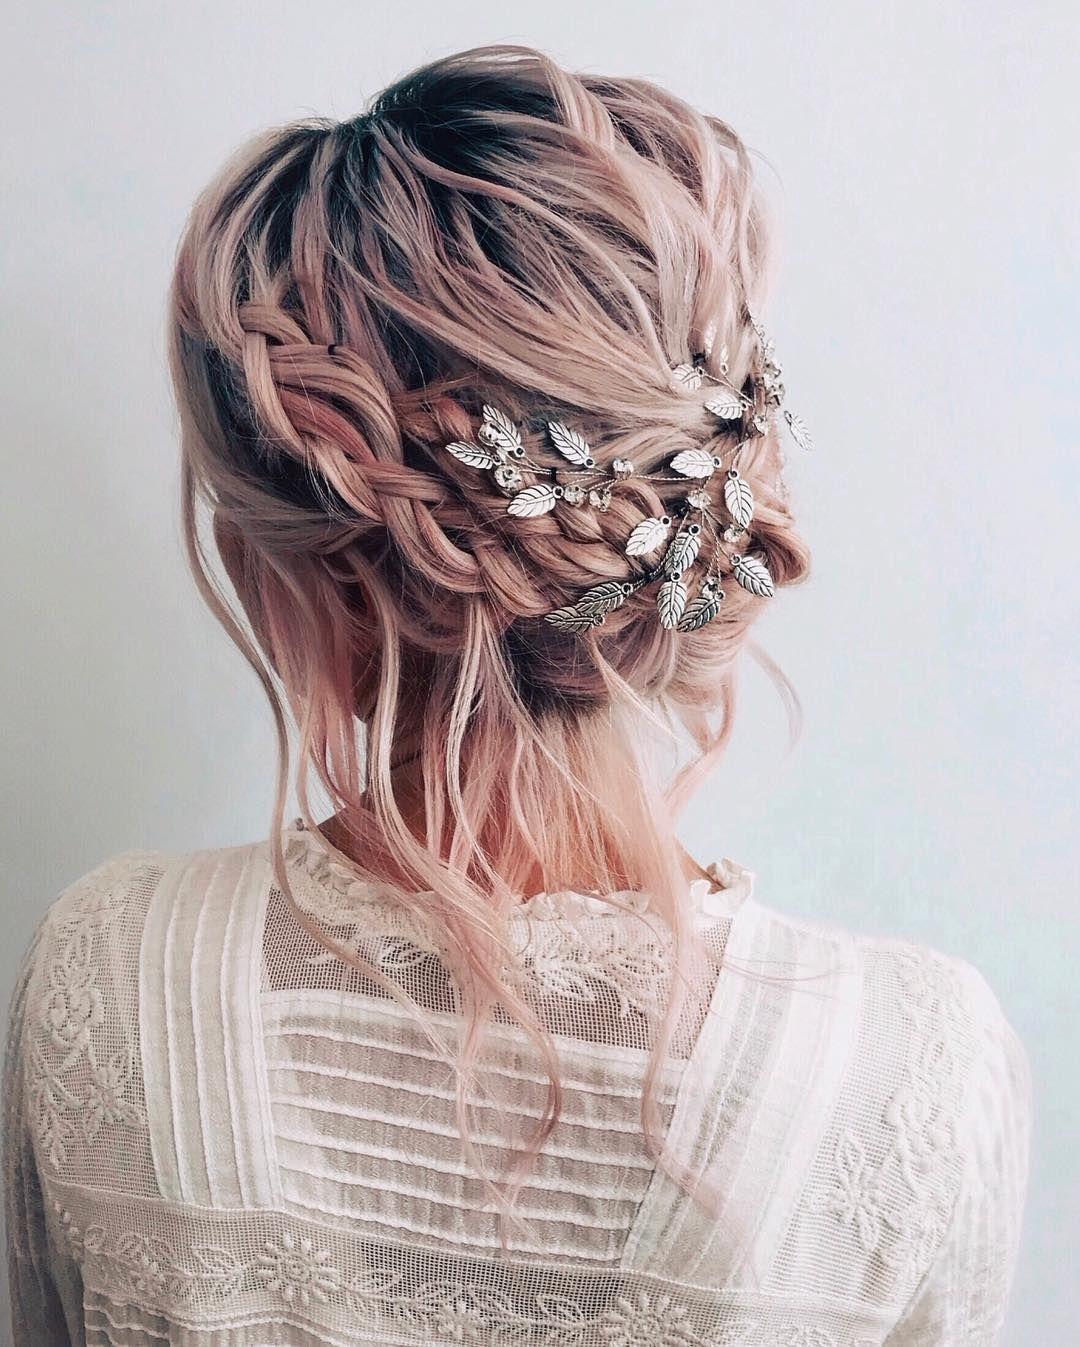 Braid crown updo